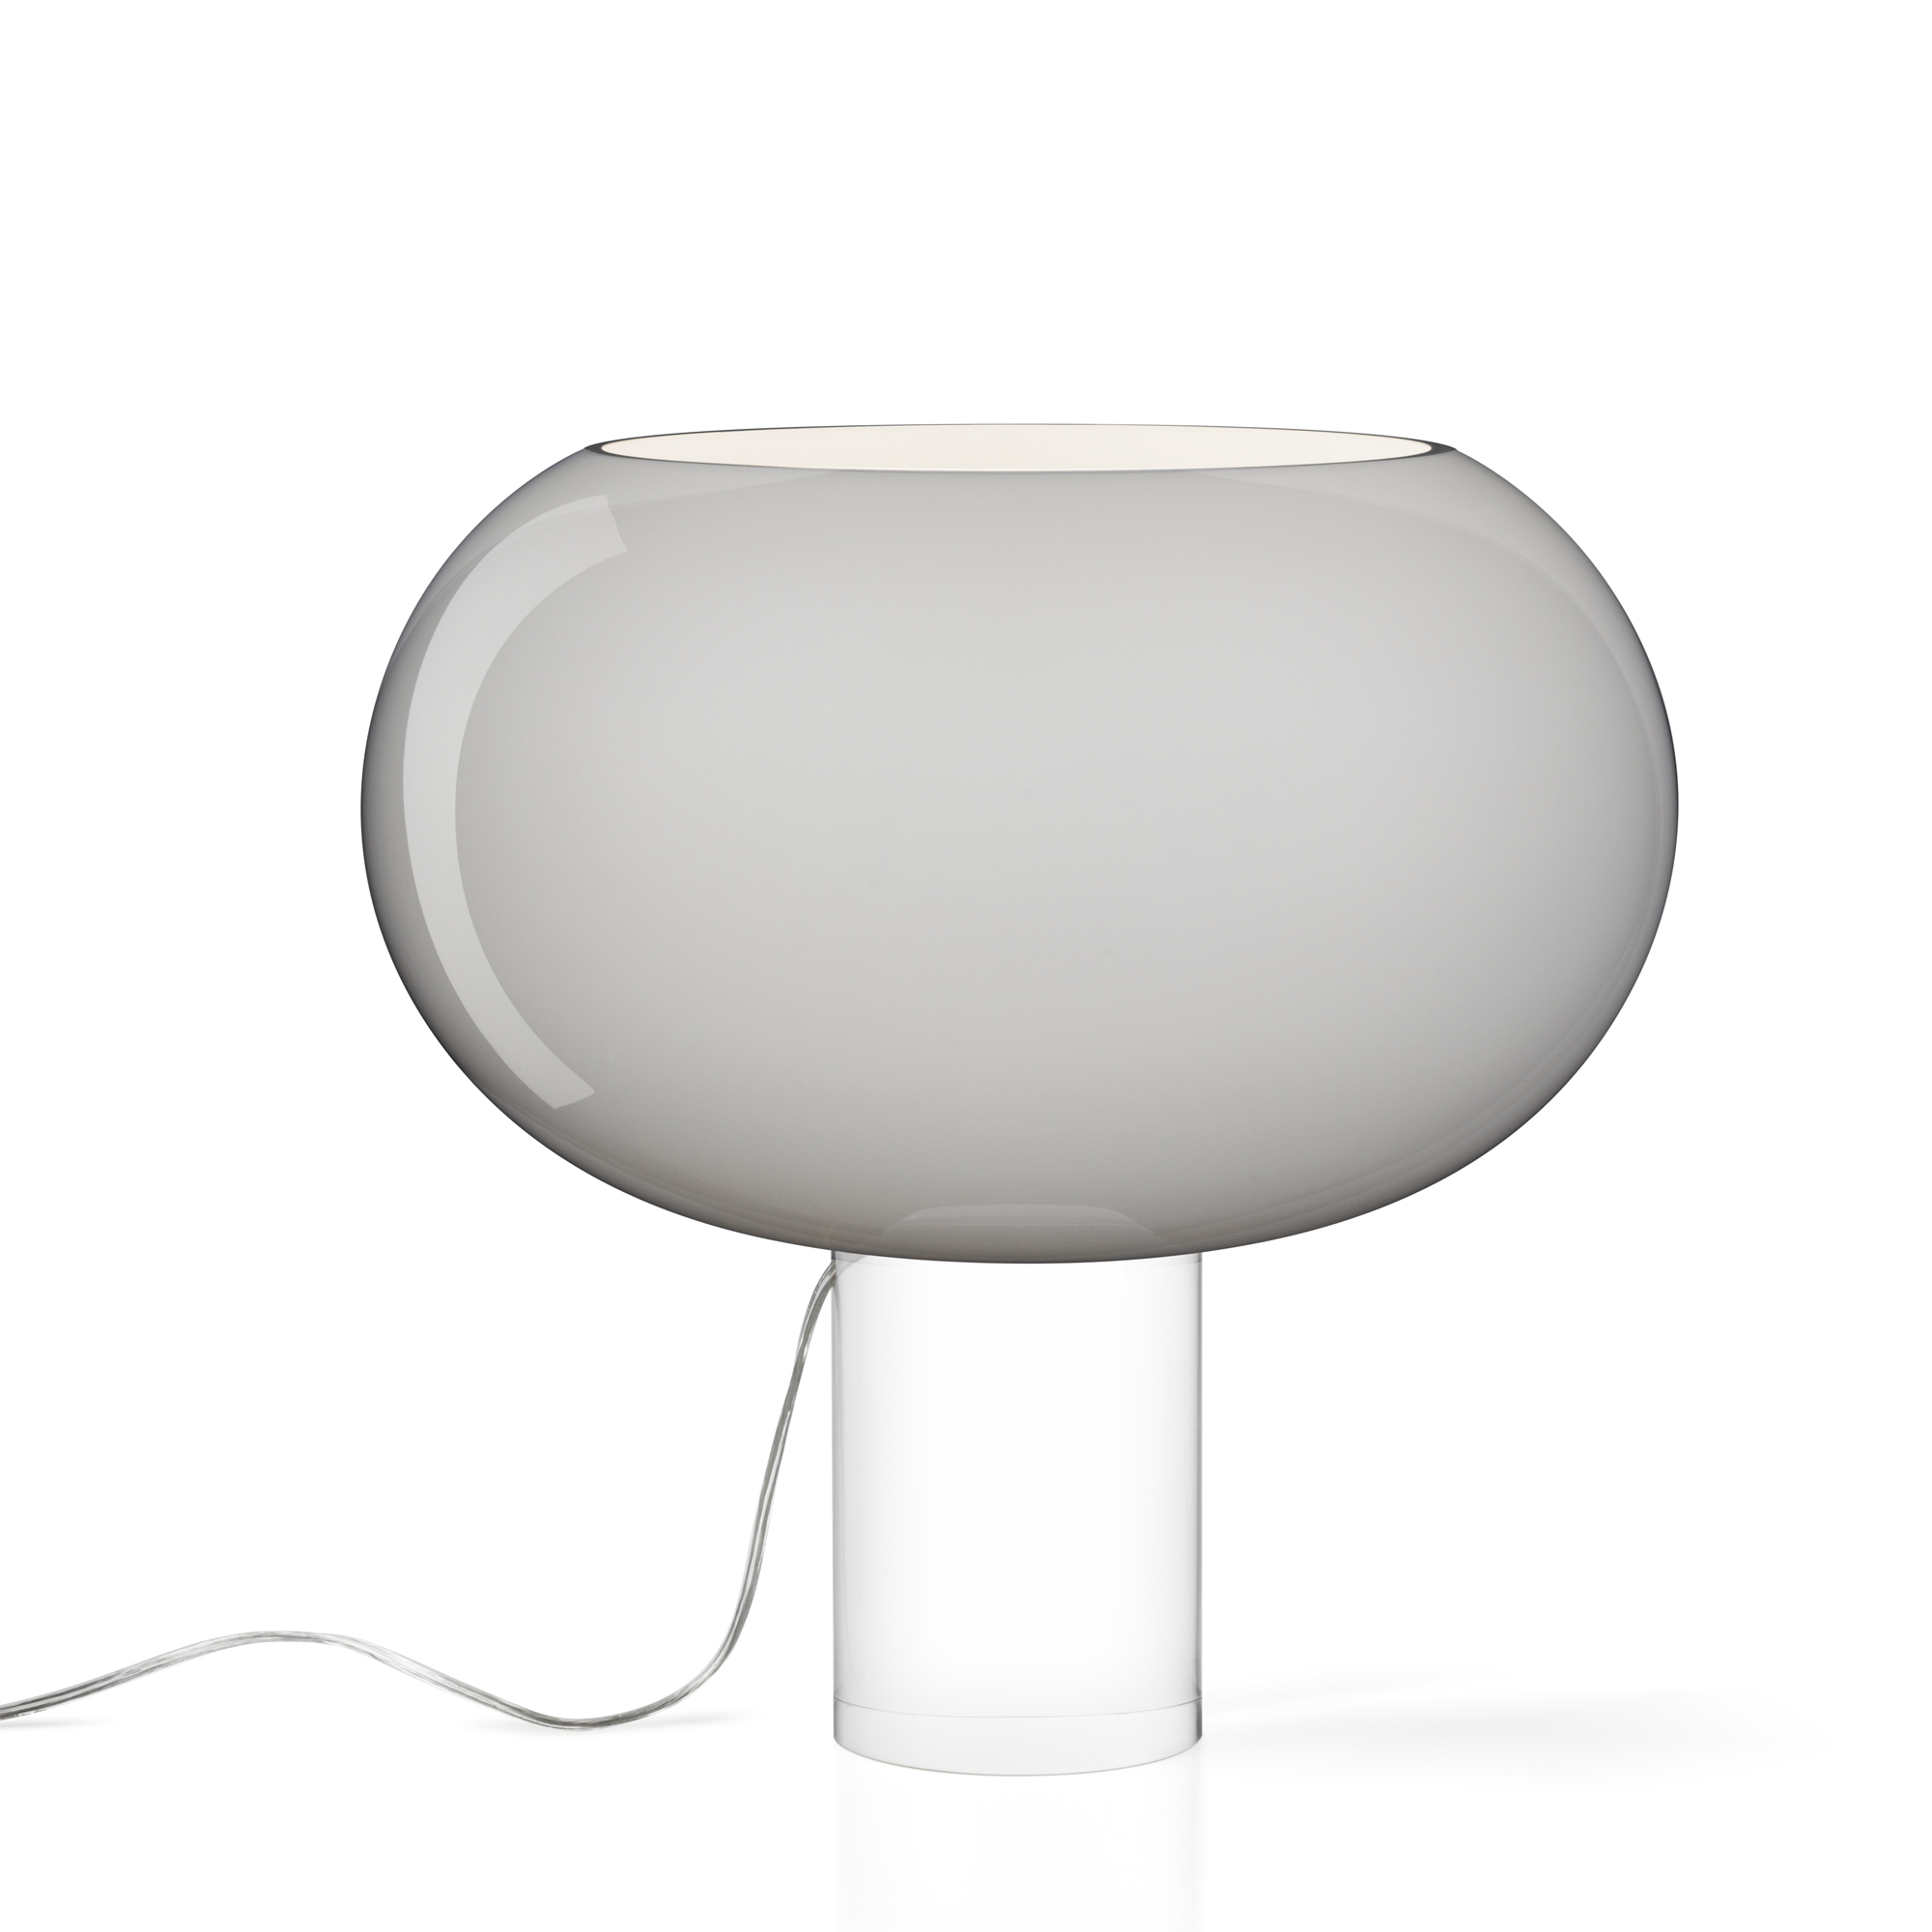 Lampe de table Buds 2, Rodolfo Dordoni, 2016